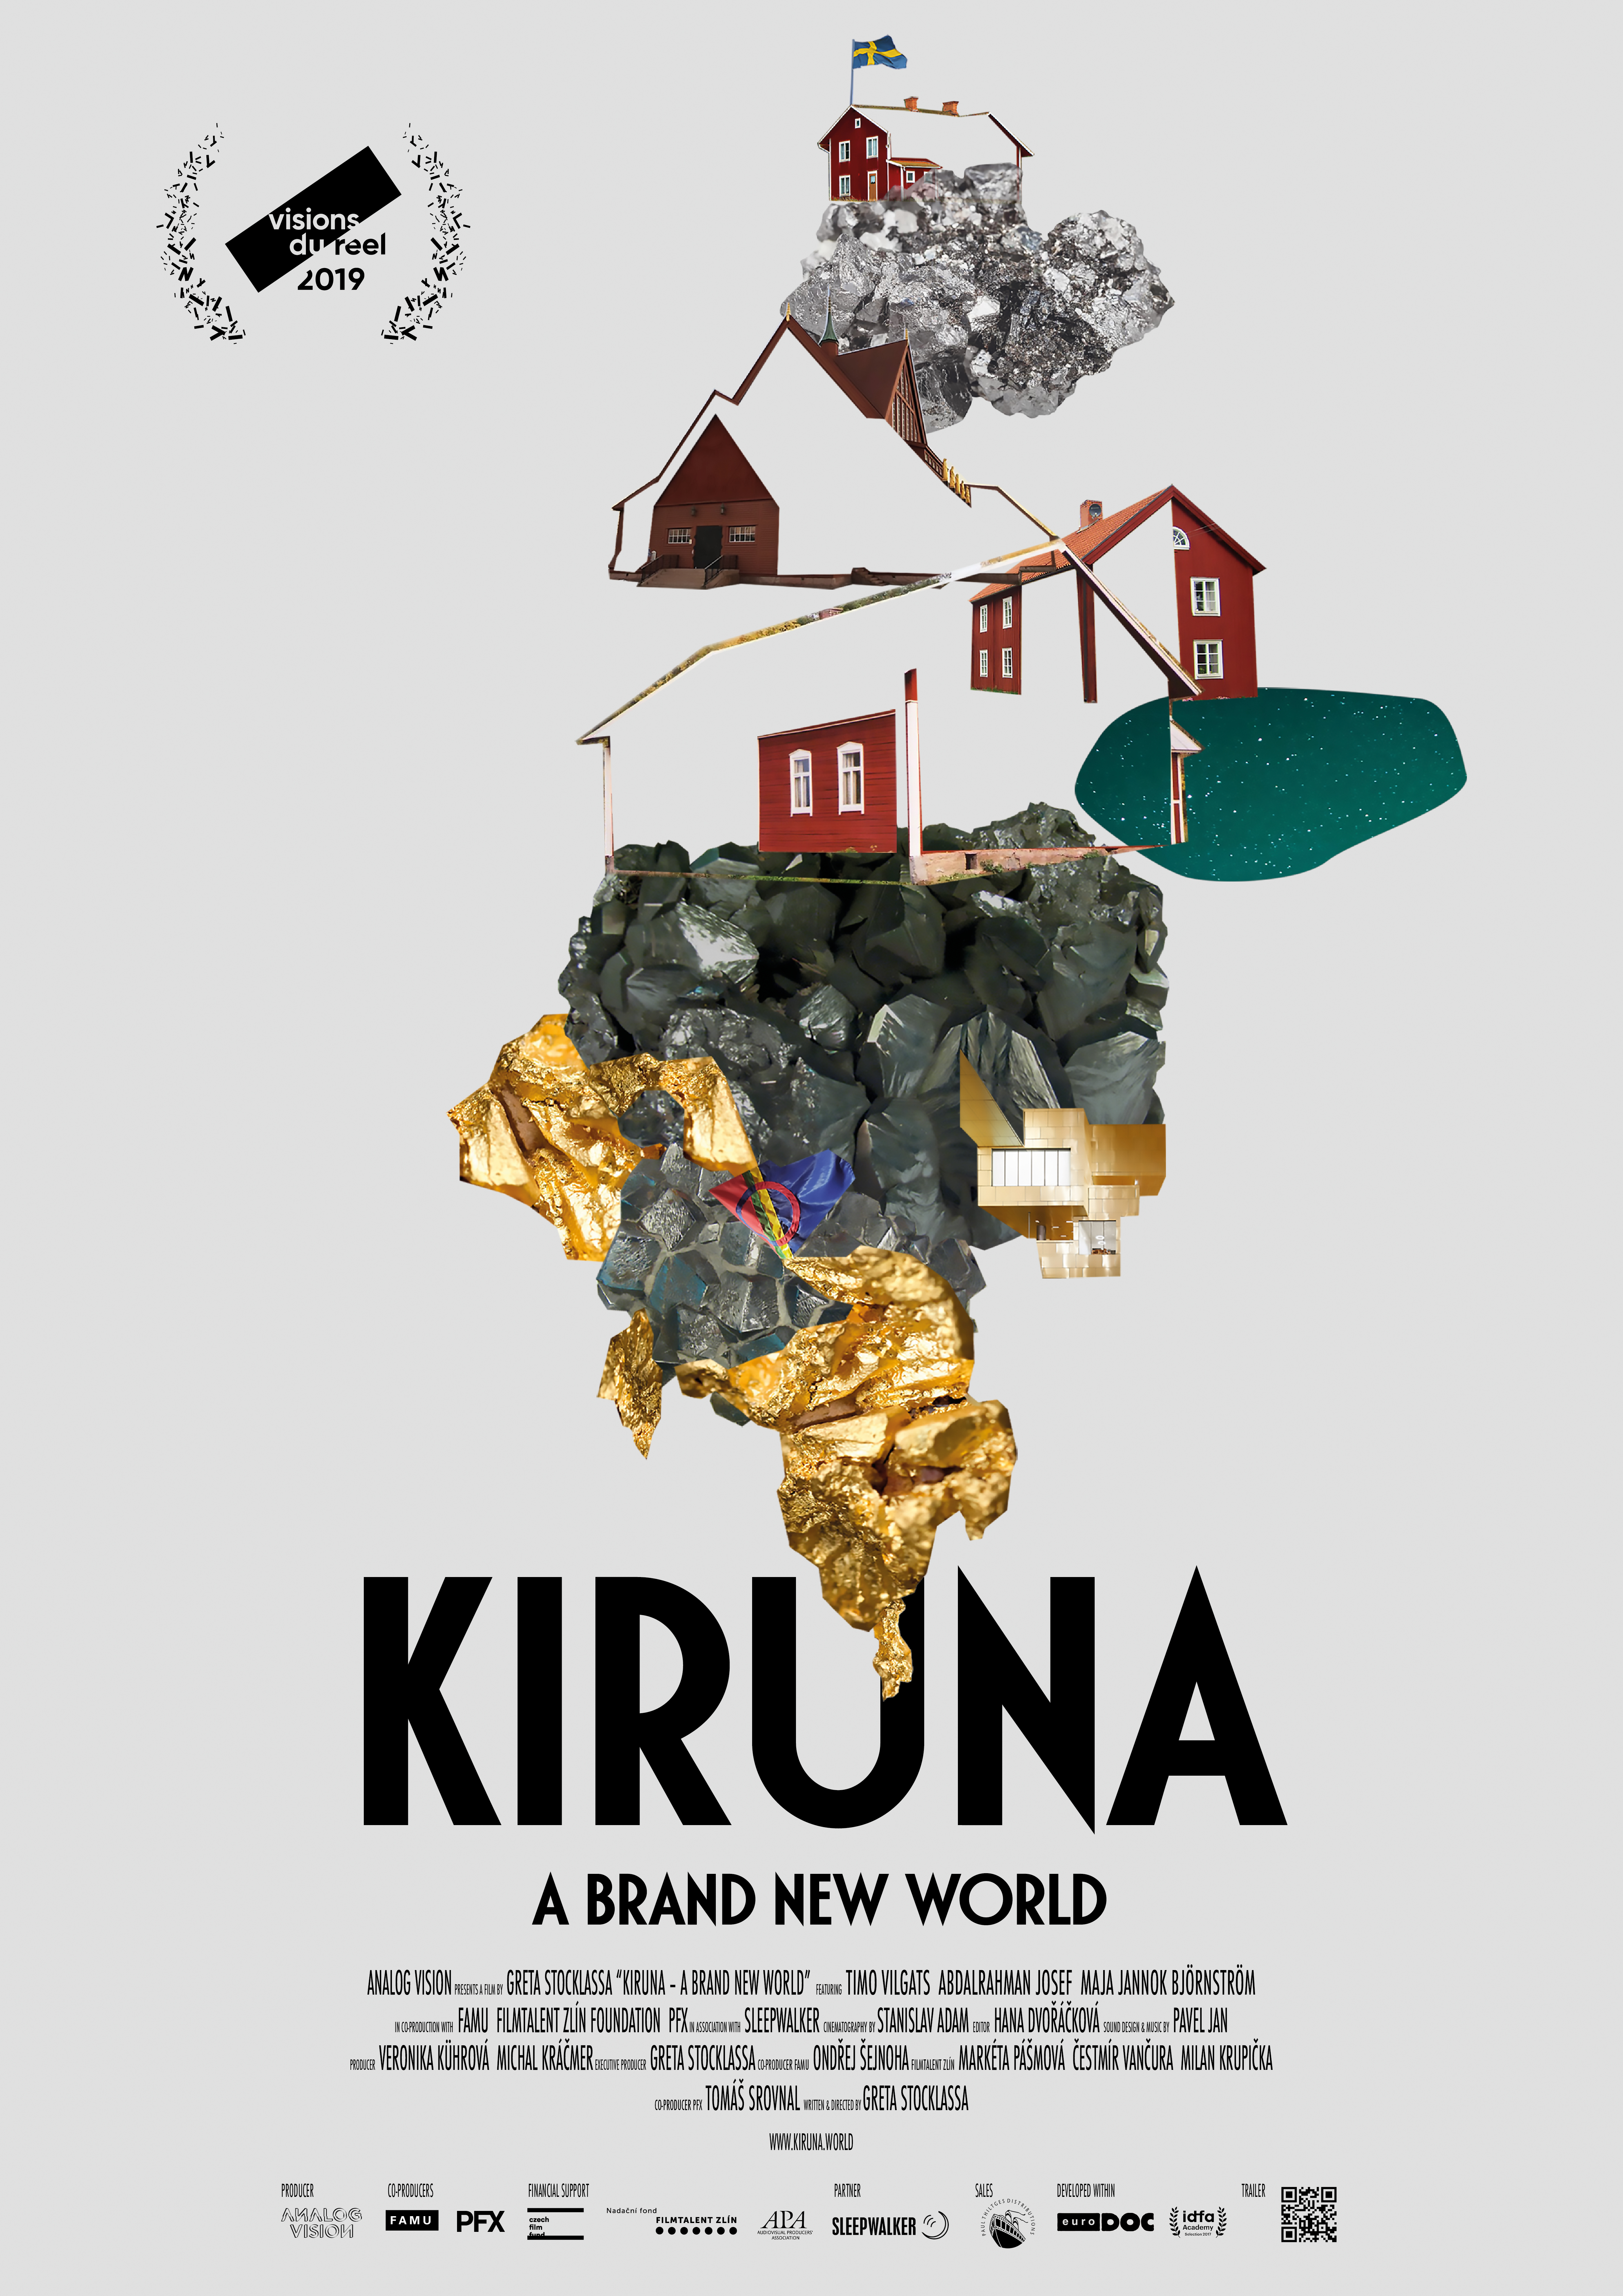 2017 - Konsultuppdrag E 10 Kiruna delprojektledare produktion mark